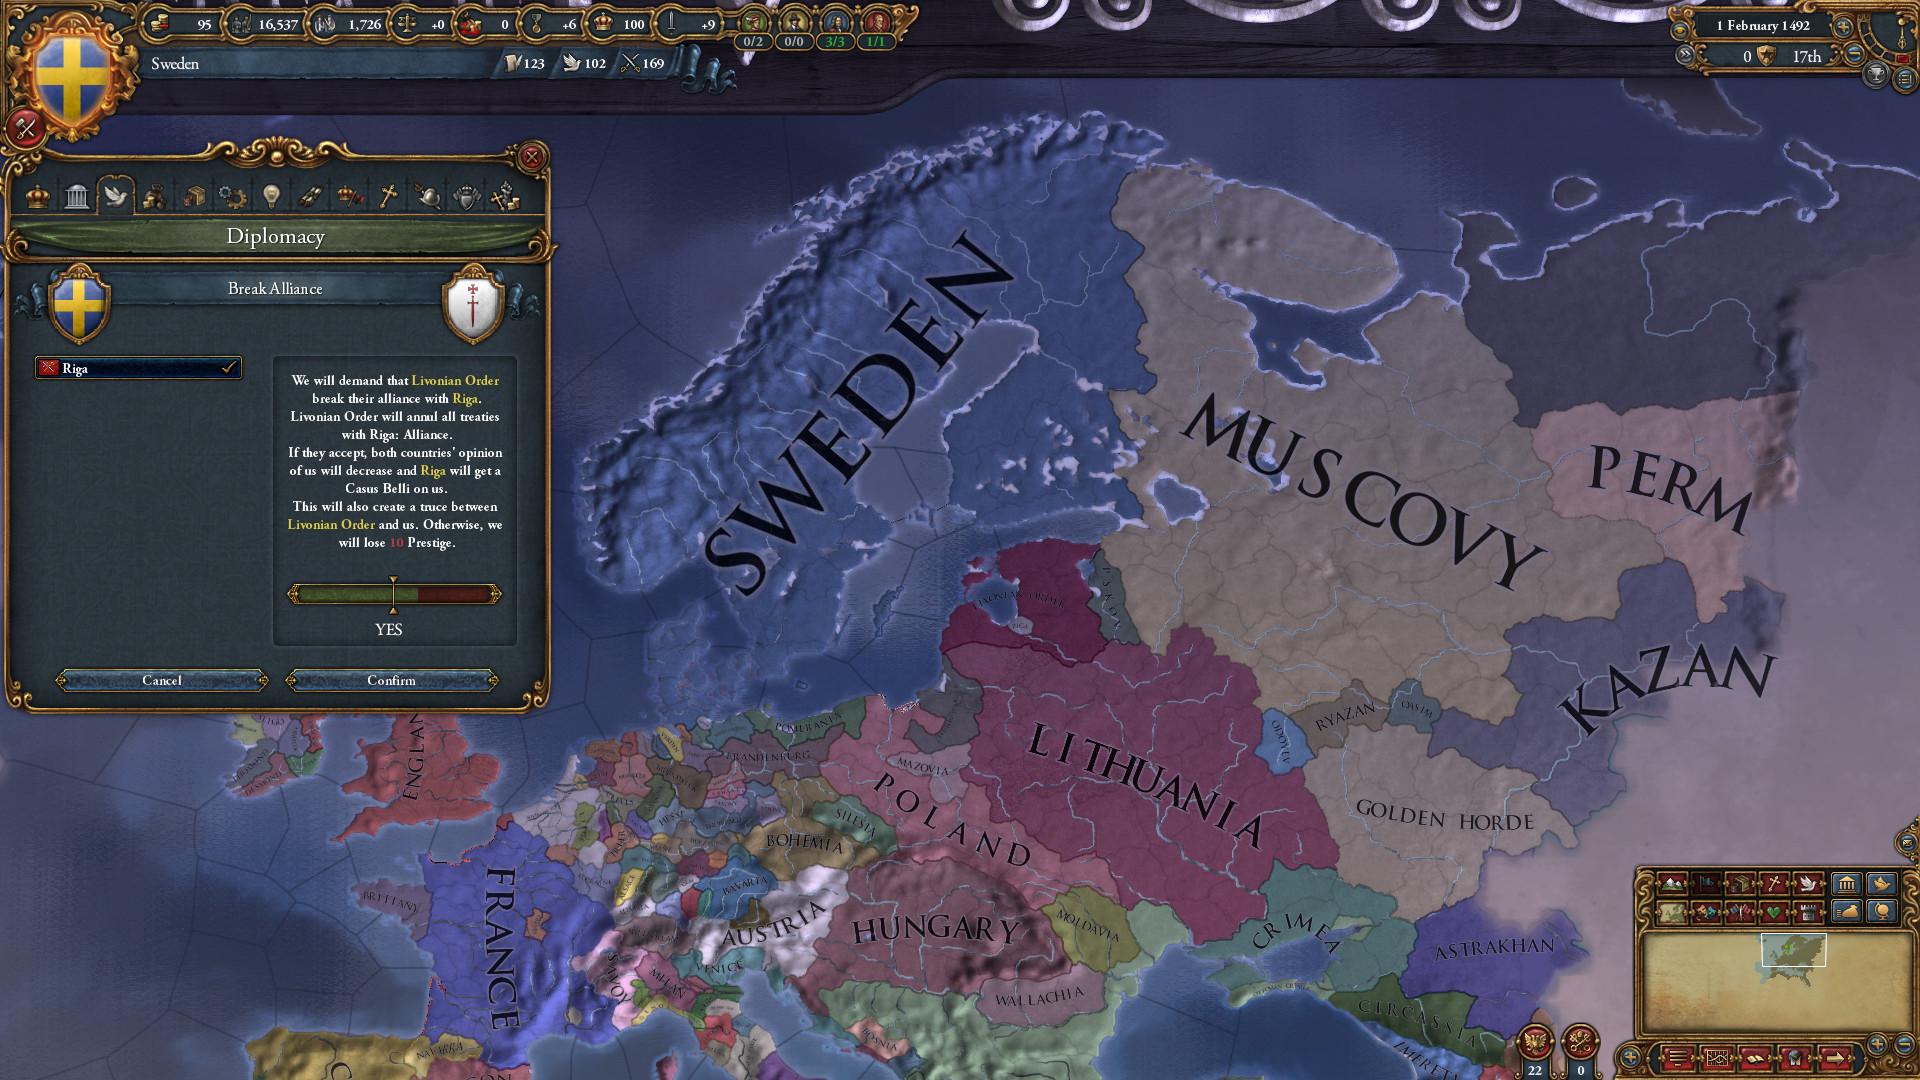 Europa Universalis IV: Rights of Man Screenshot 1